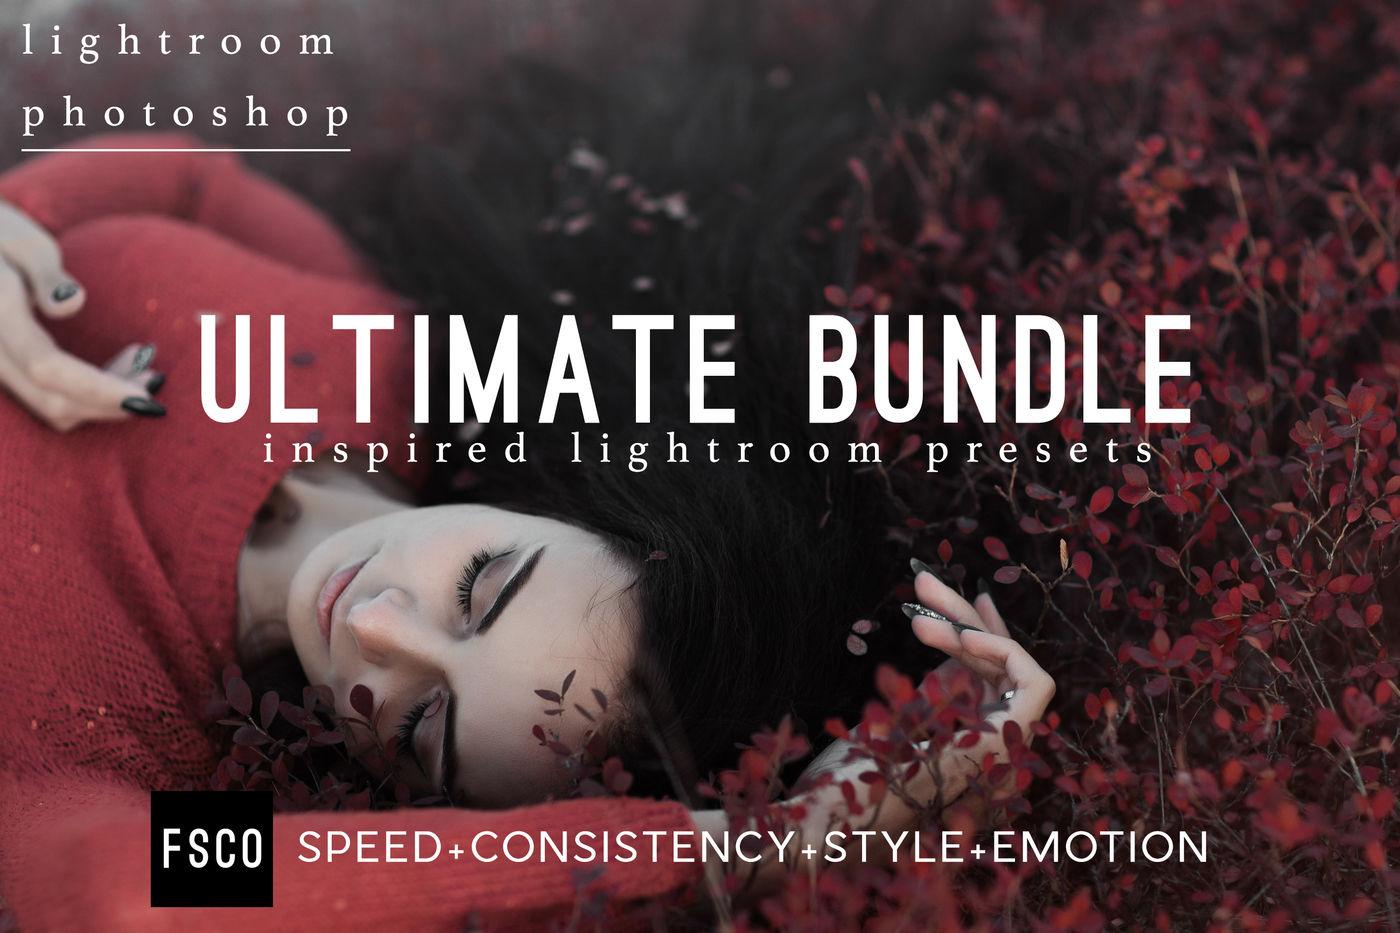 Ultimate Bundle Lightroom Presets Photoshop Acr Filters By